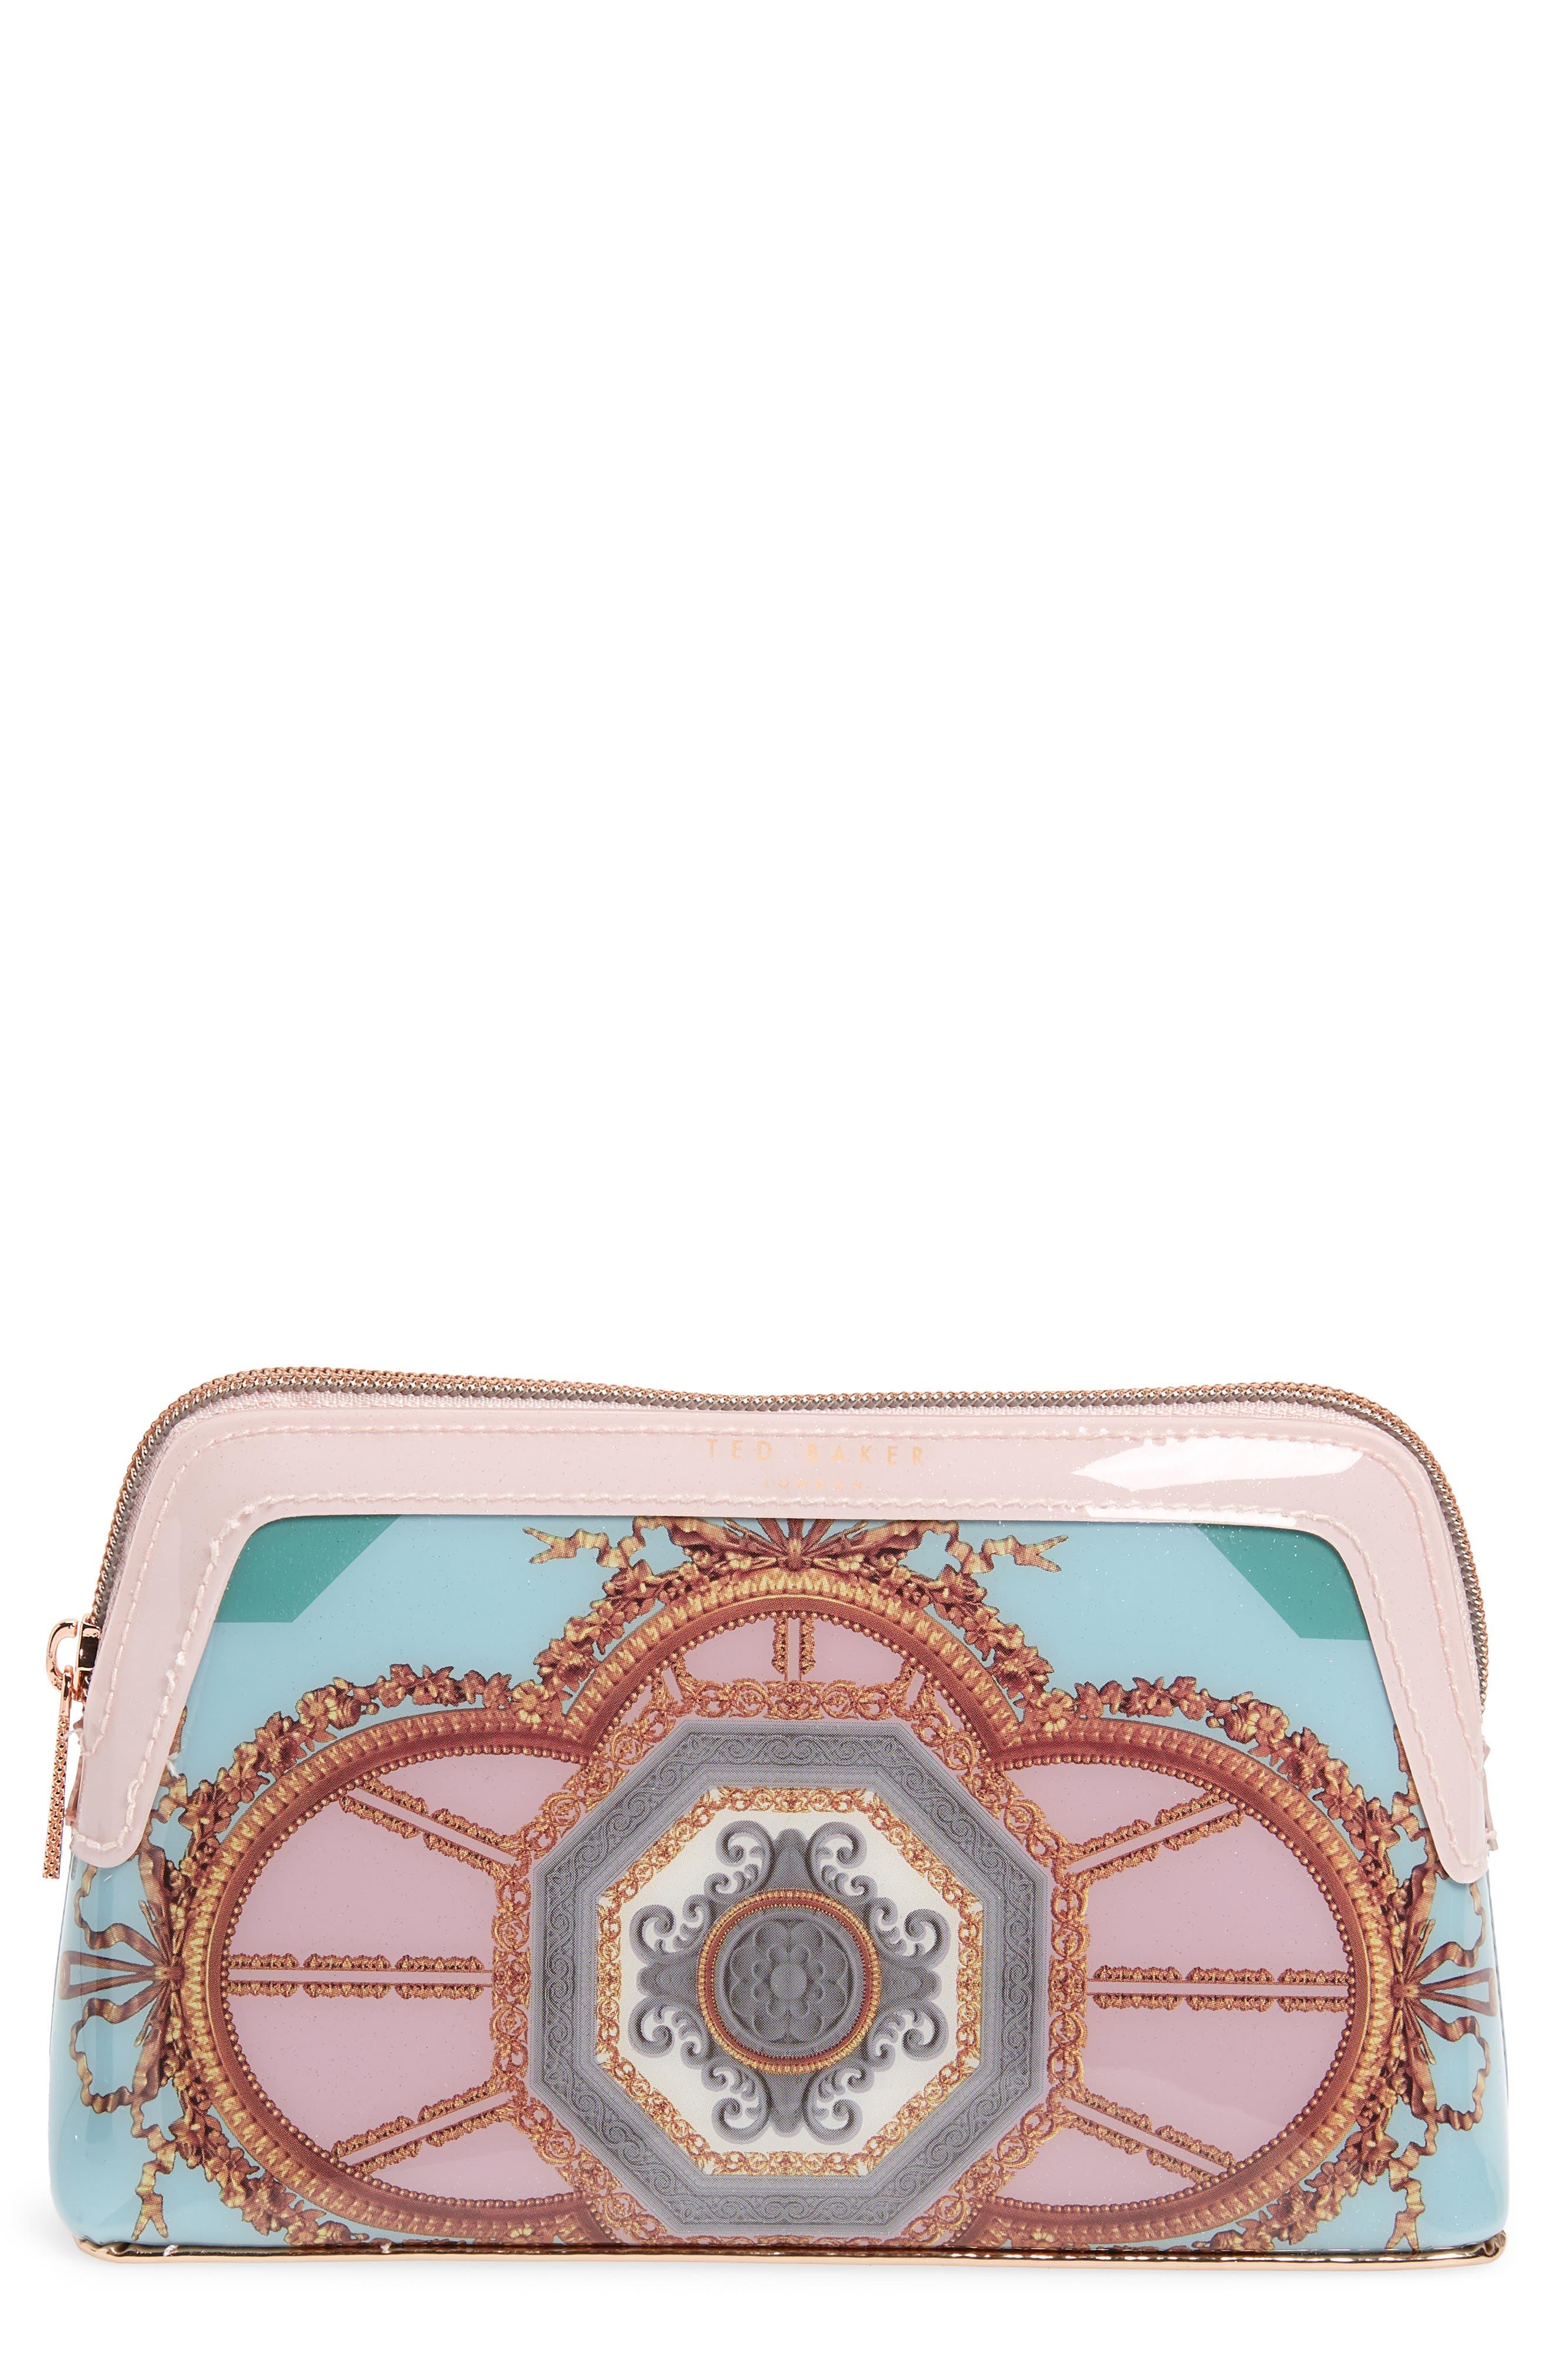 Dona Versailles Print Cosmetics Bag,                             Main thumbnail 1, color,                             Teal